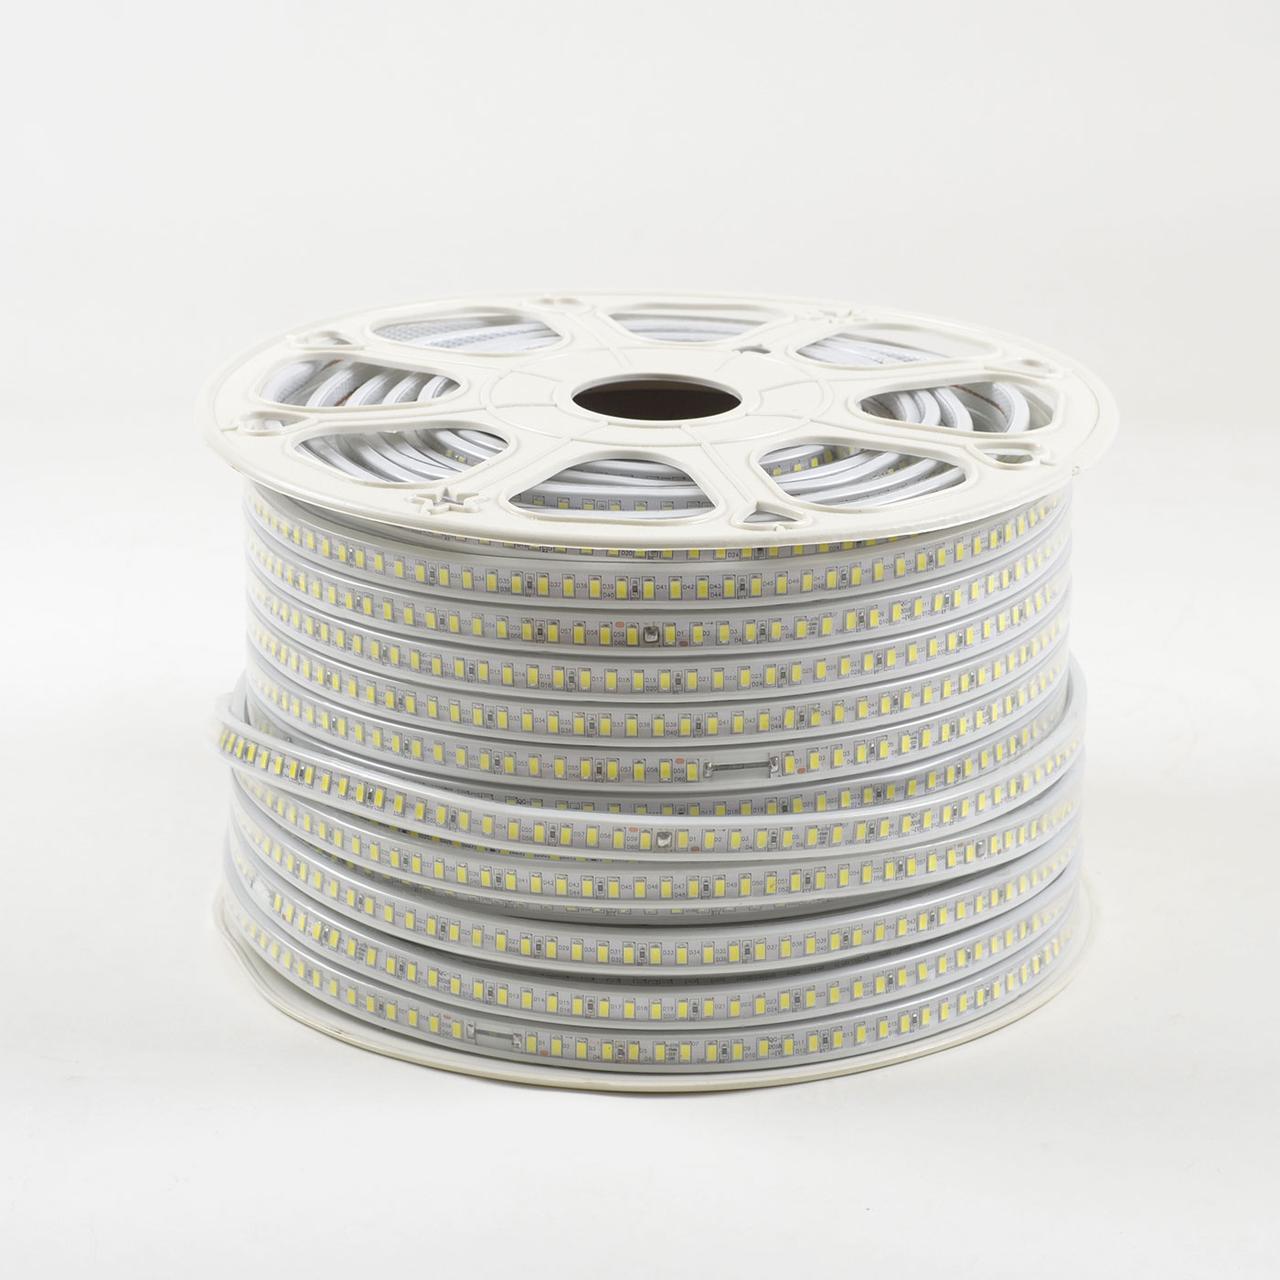 Светодиодная лента Venom SMD 5730 120д.м. (IP67) 220V (VP-5730220120-Y)